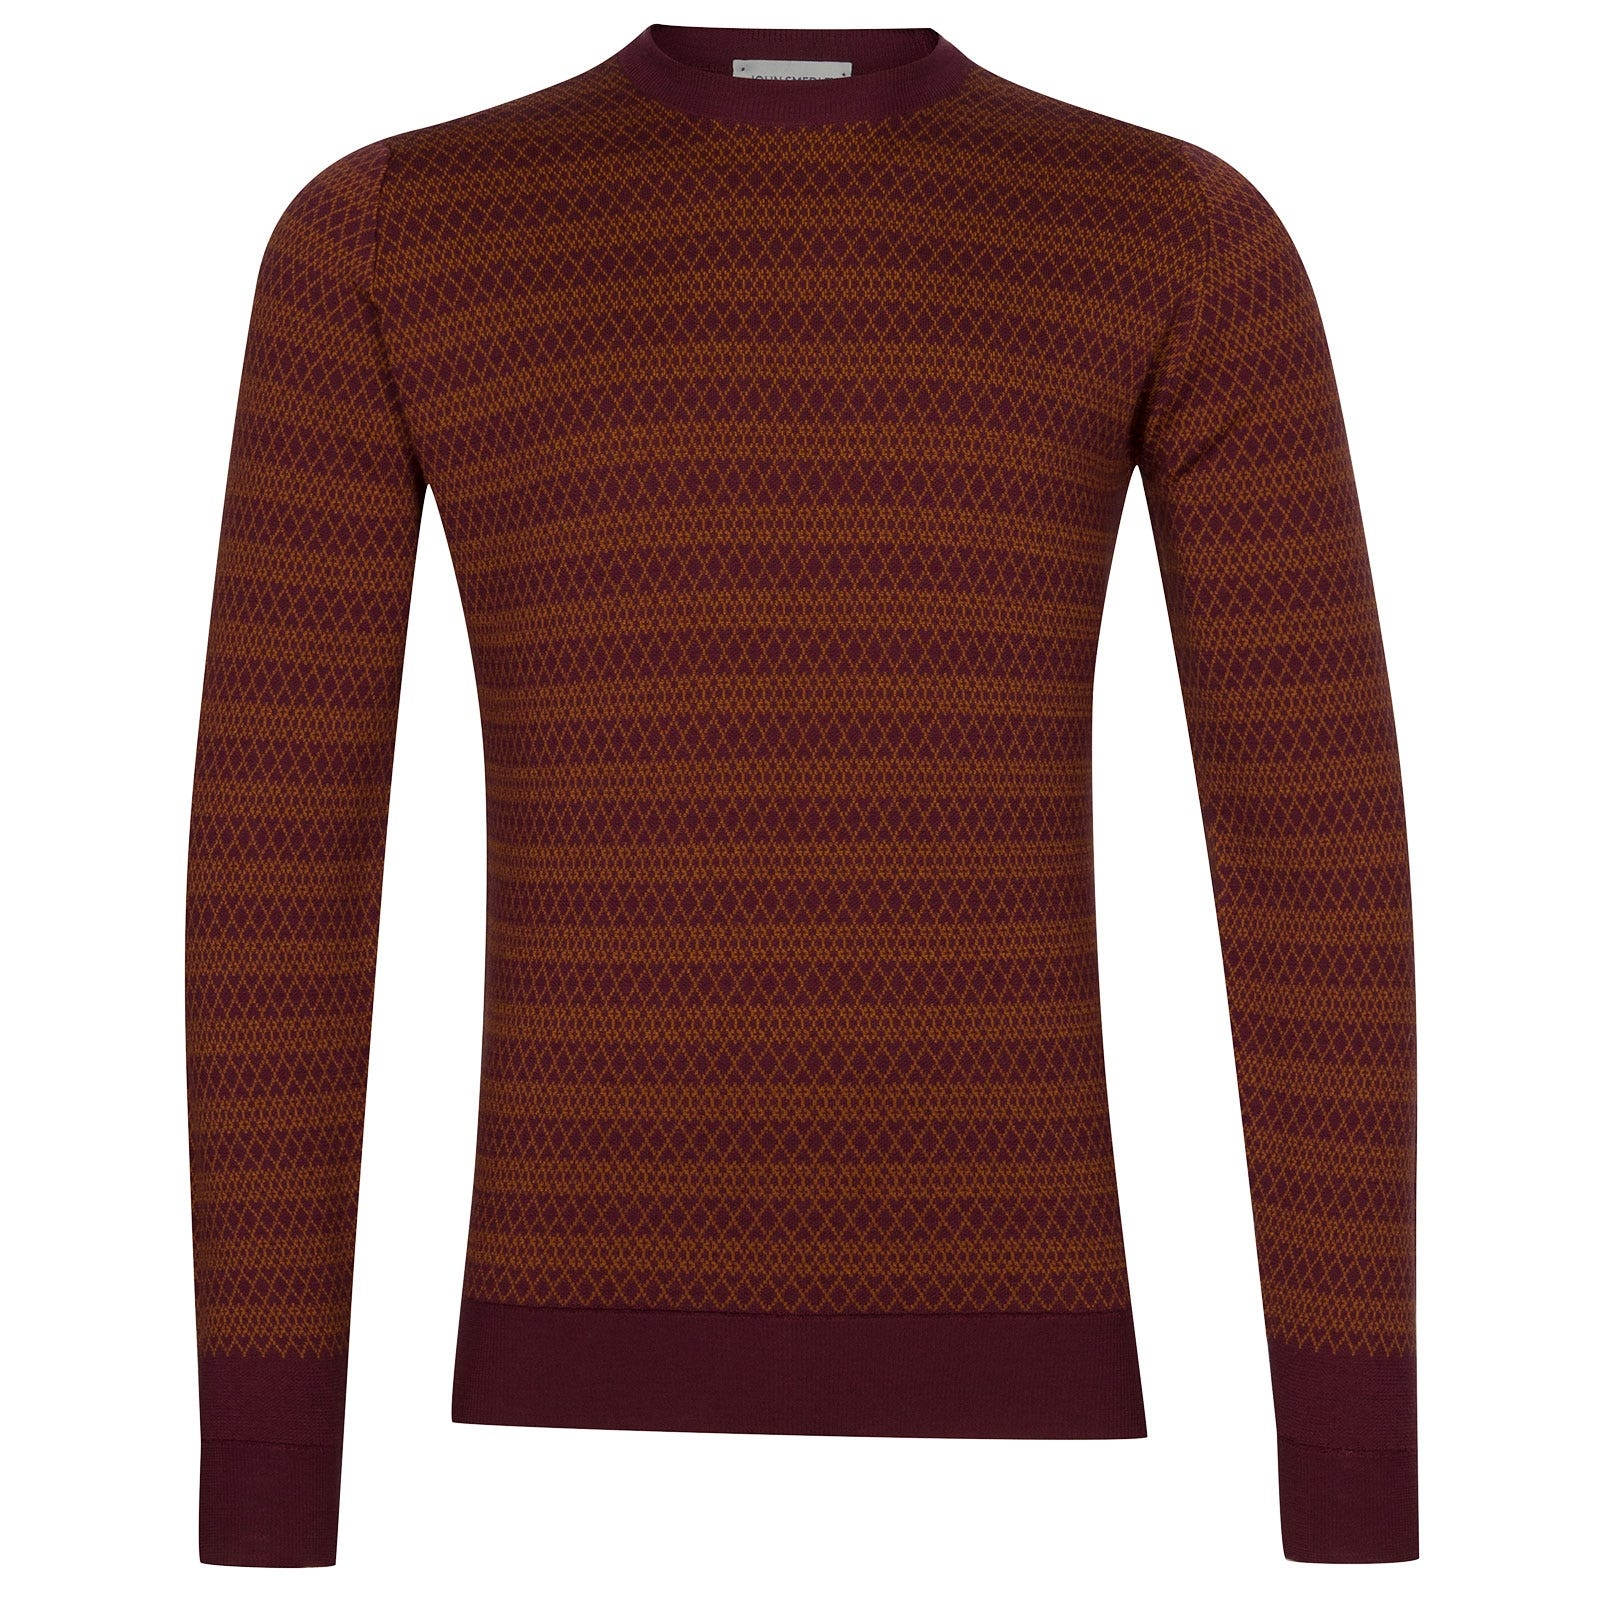 John Smedley Baldo Extra Fine Merino Wool Pullover in Bordeaux-XL